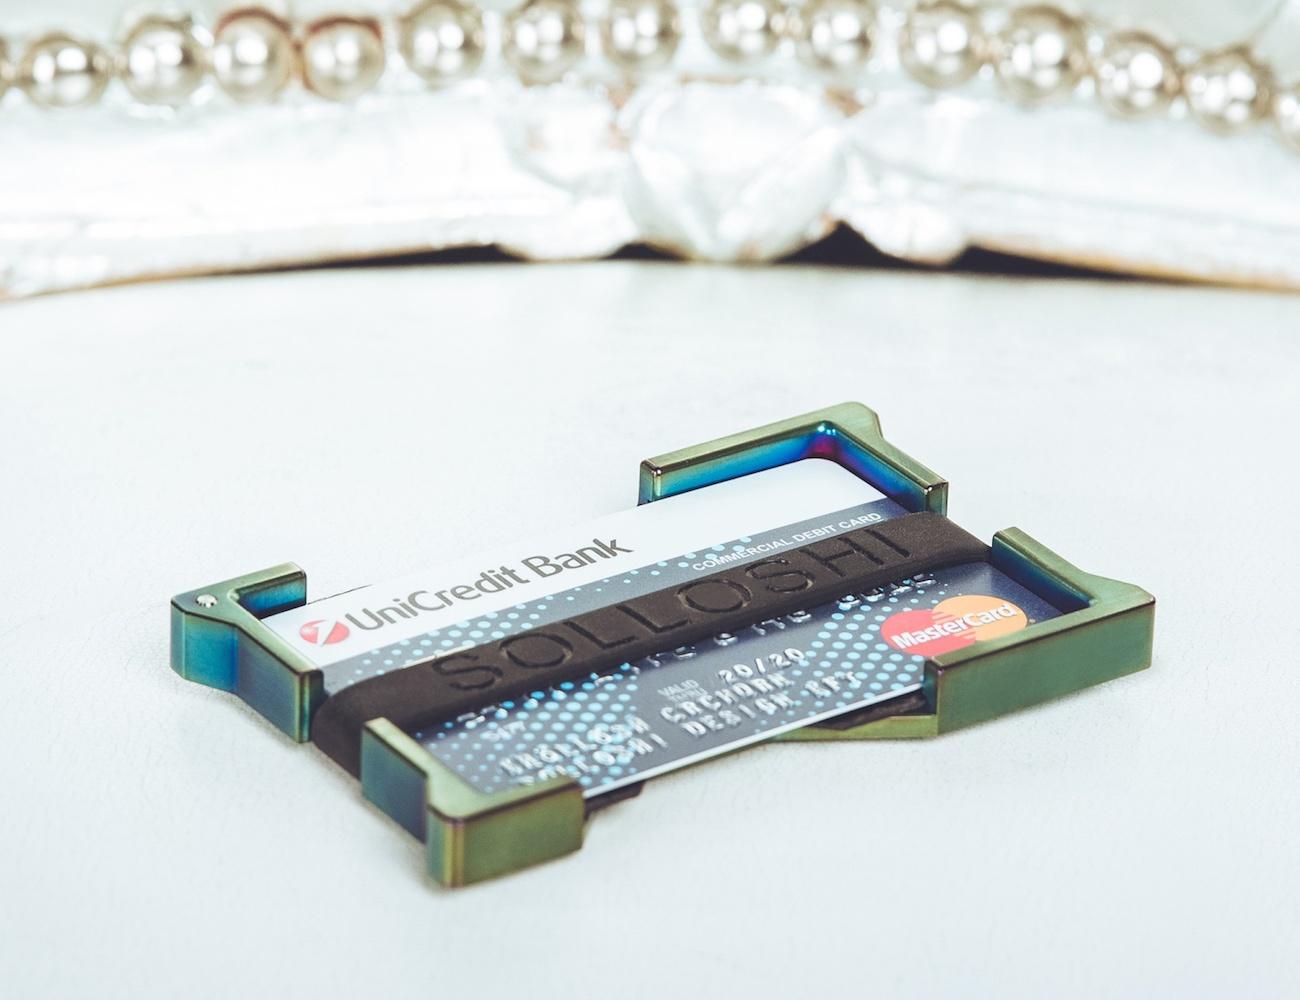 Series 38 Luxury Bank Card Holder